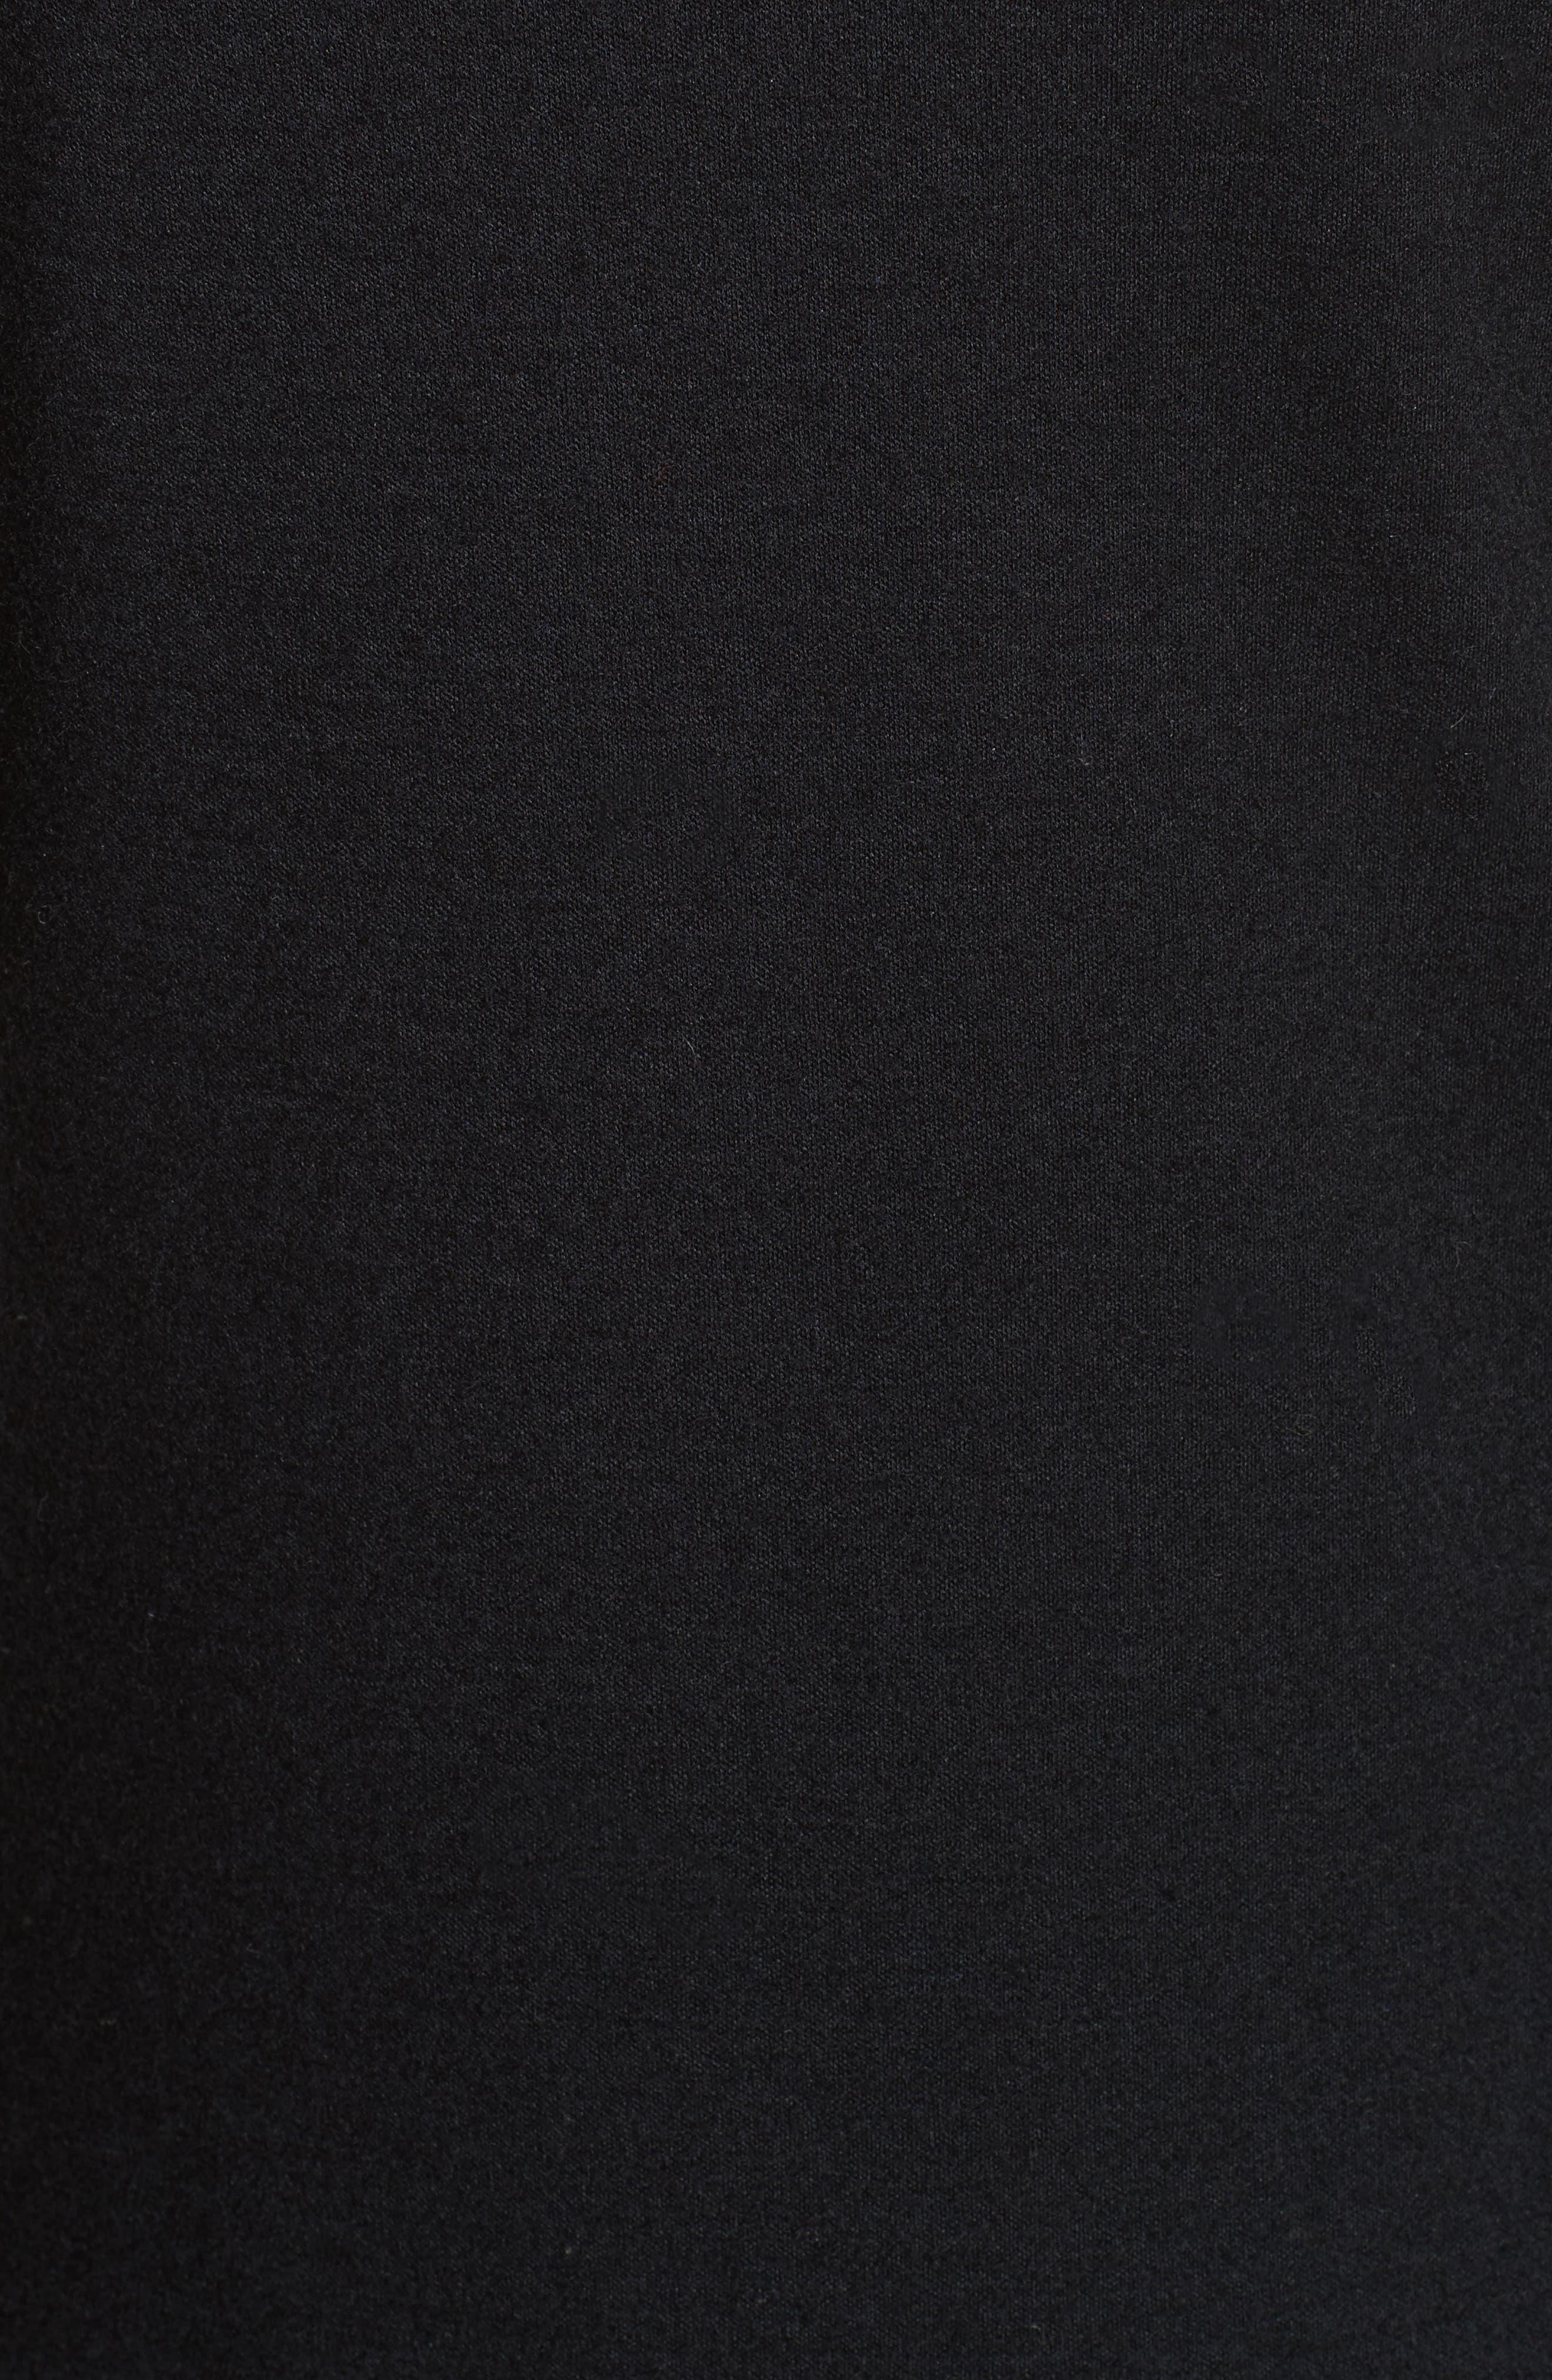 Slash Cuff Wool Blend Dress,                             Alternate thumbnail 5, color,                             001